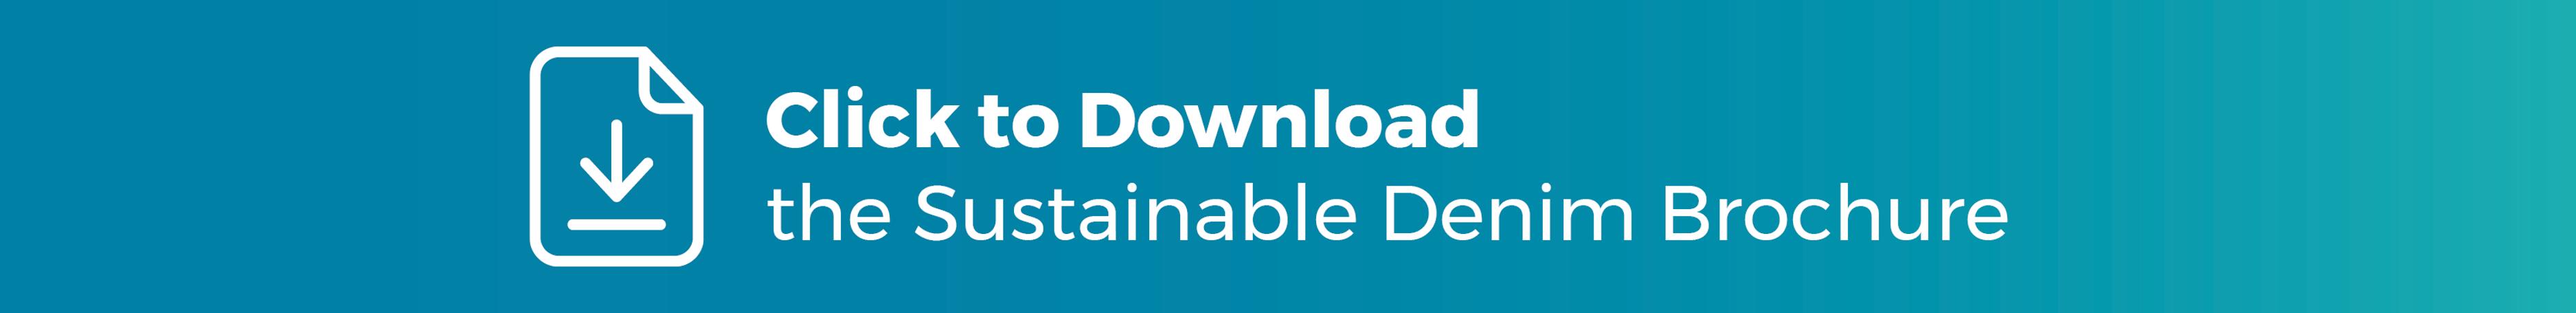 Sustainable Denim Brochure